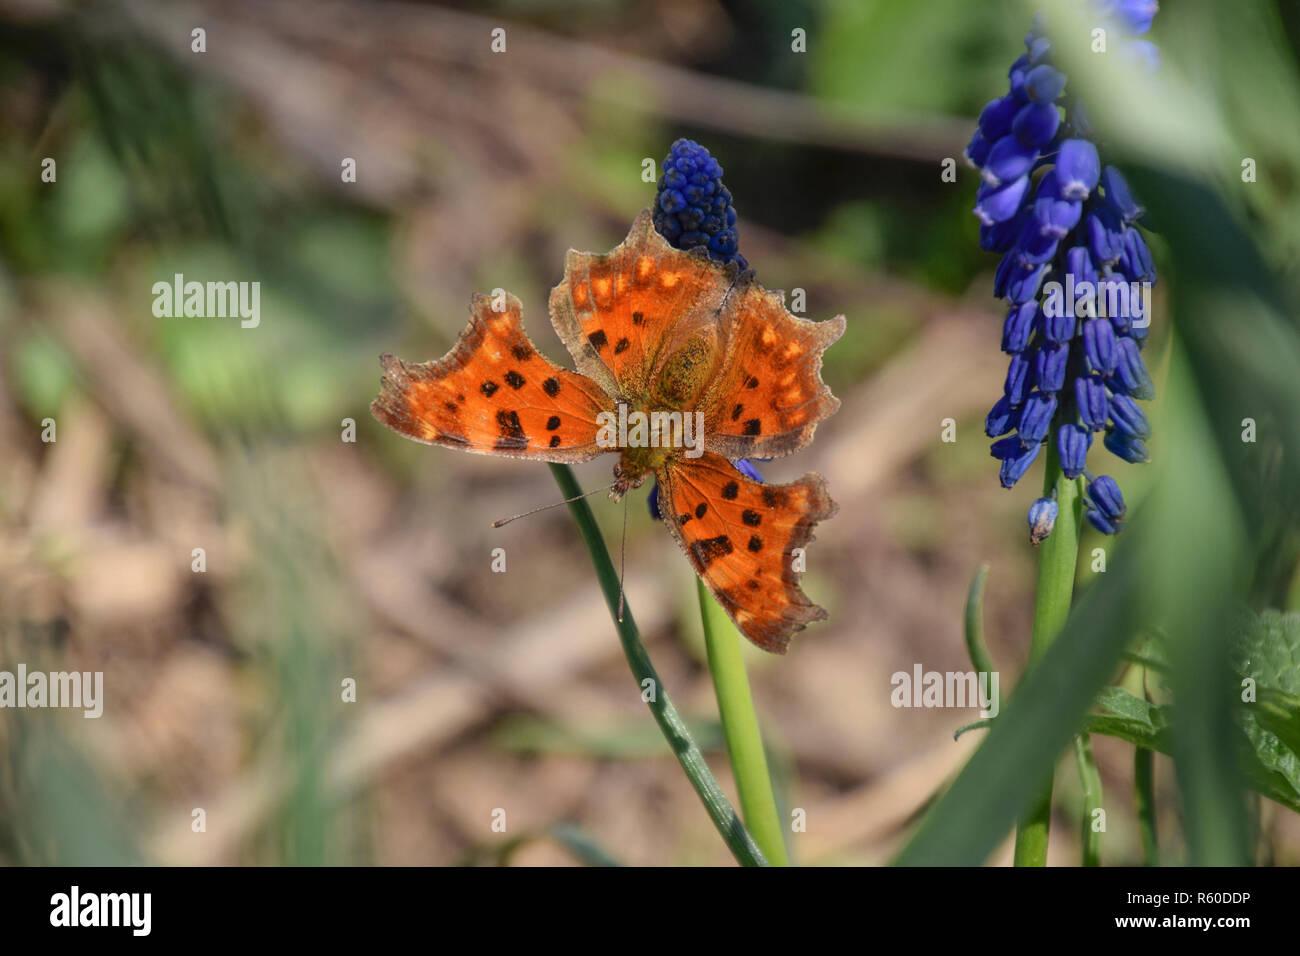 Polygonia c-album on a flower - Stock Image